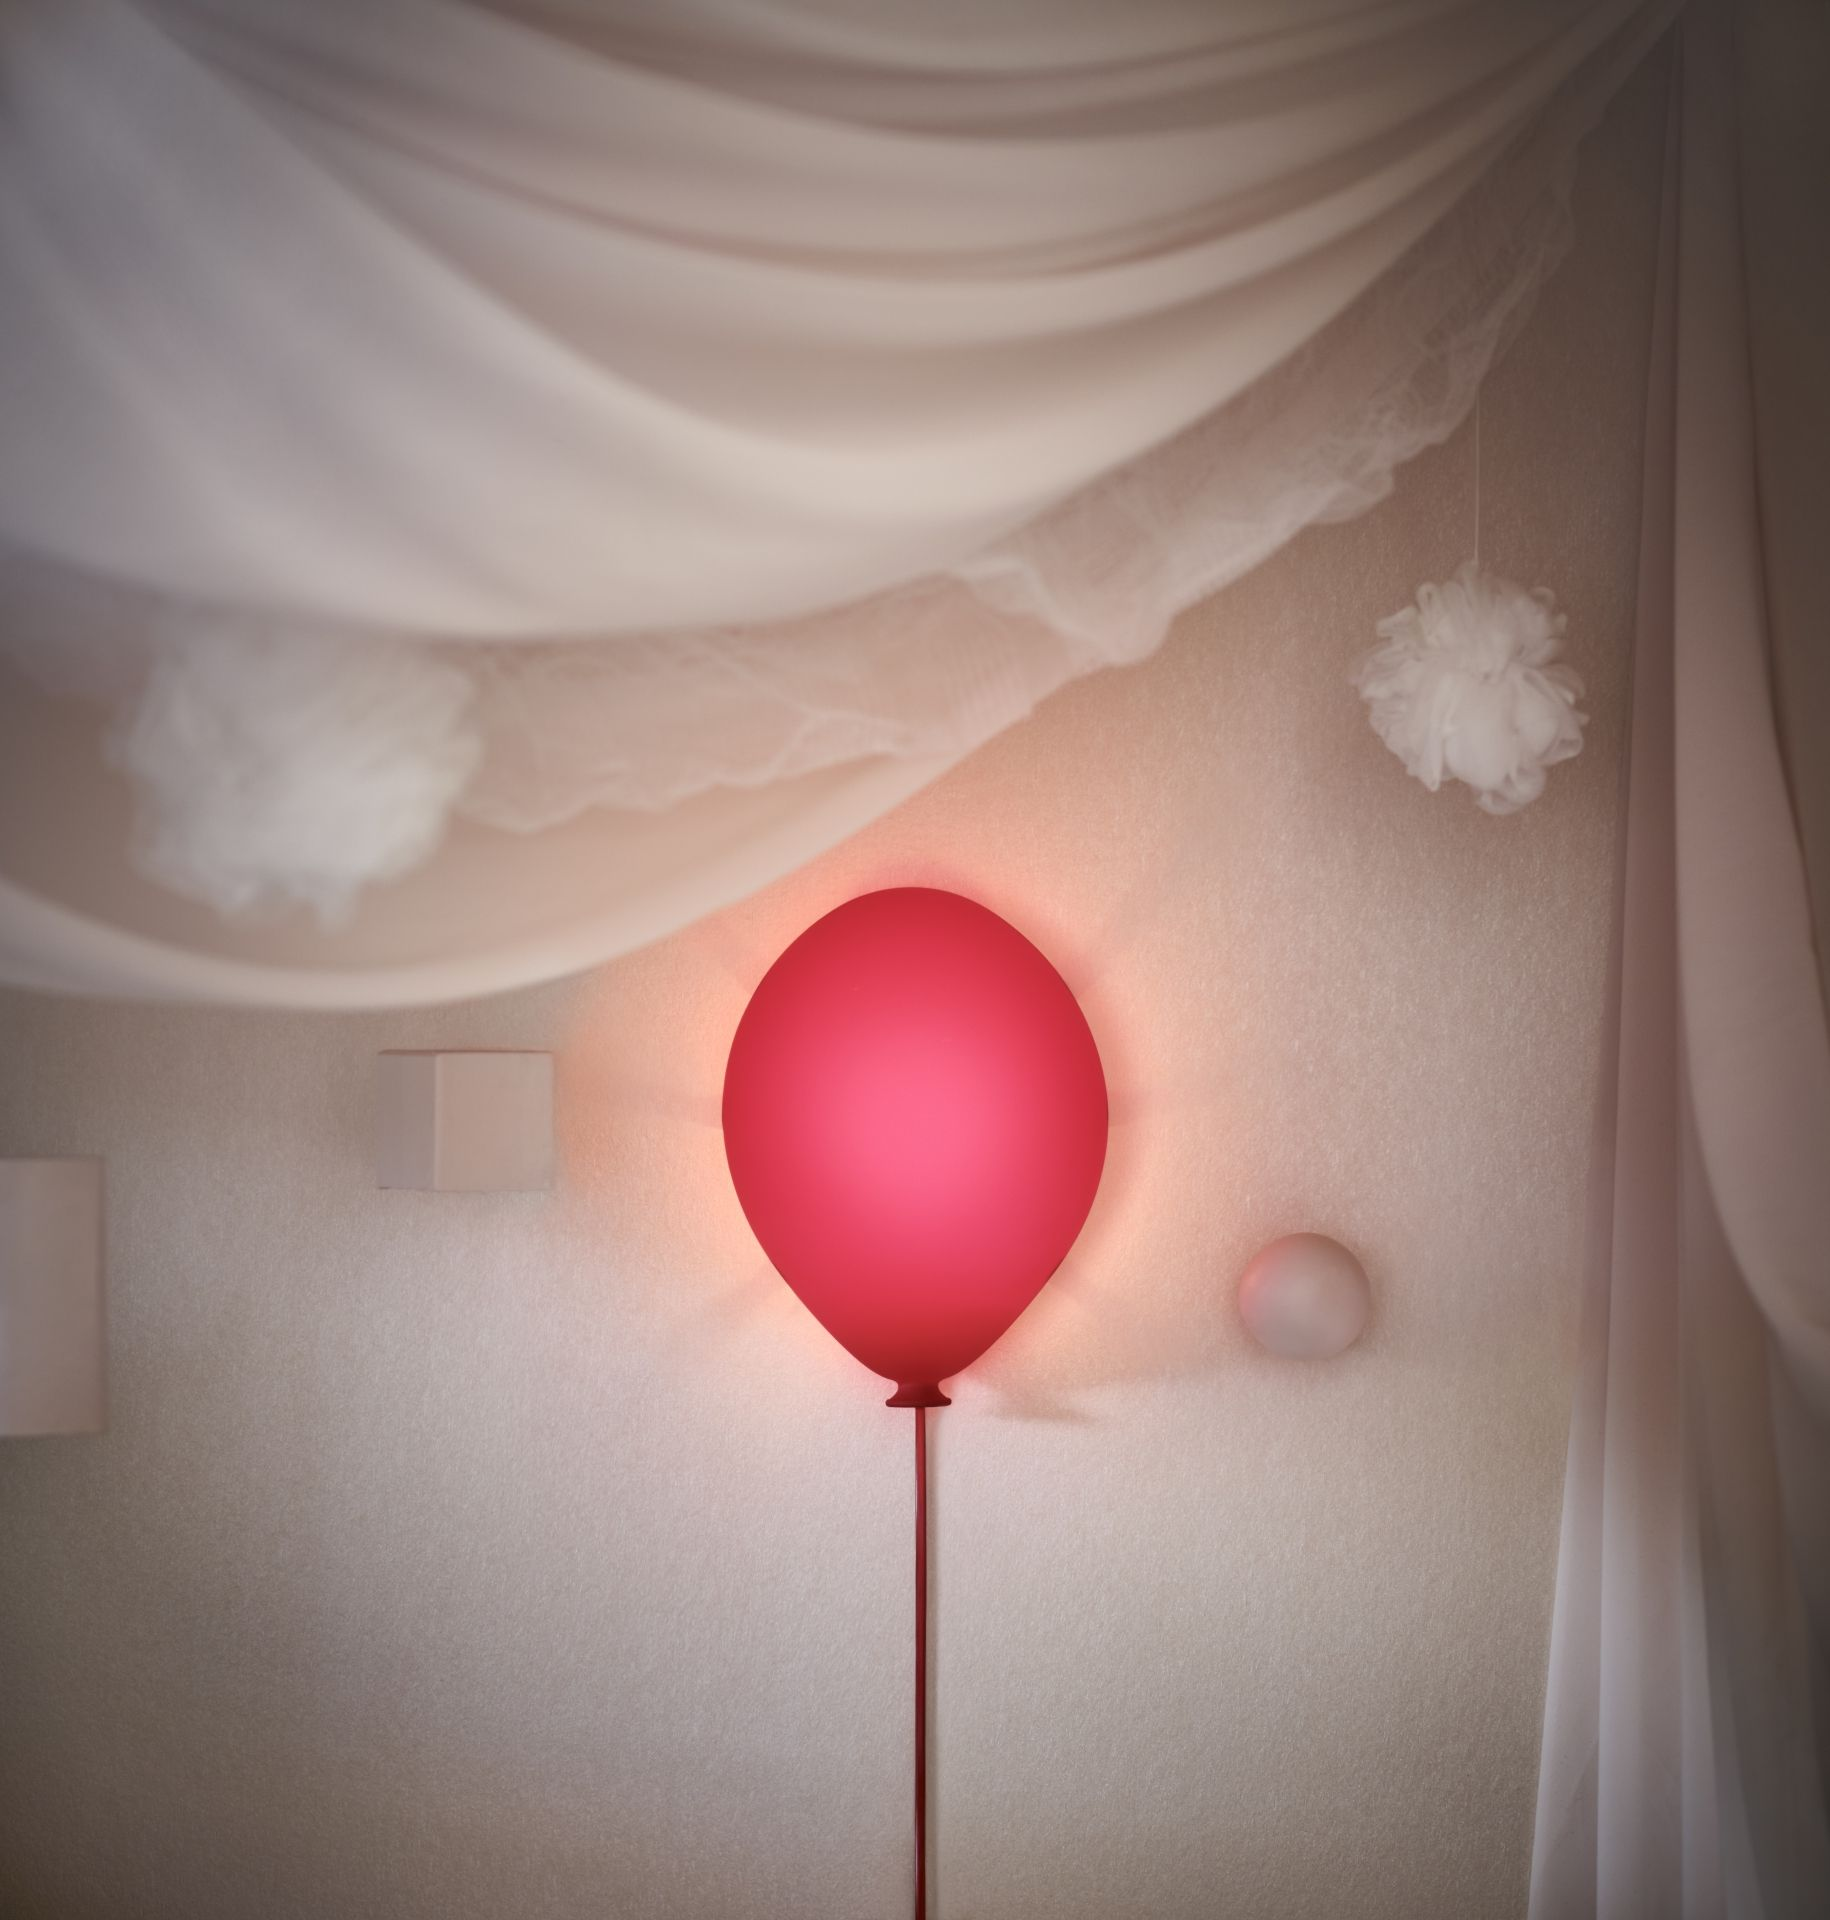 DRÖMMINGE wandlamp | IKEA IKEAnederland IKEAnl slaapkamer ...